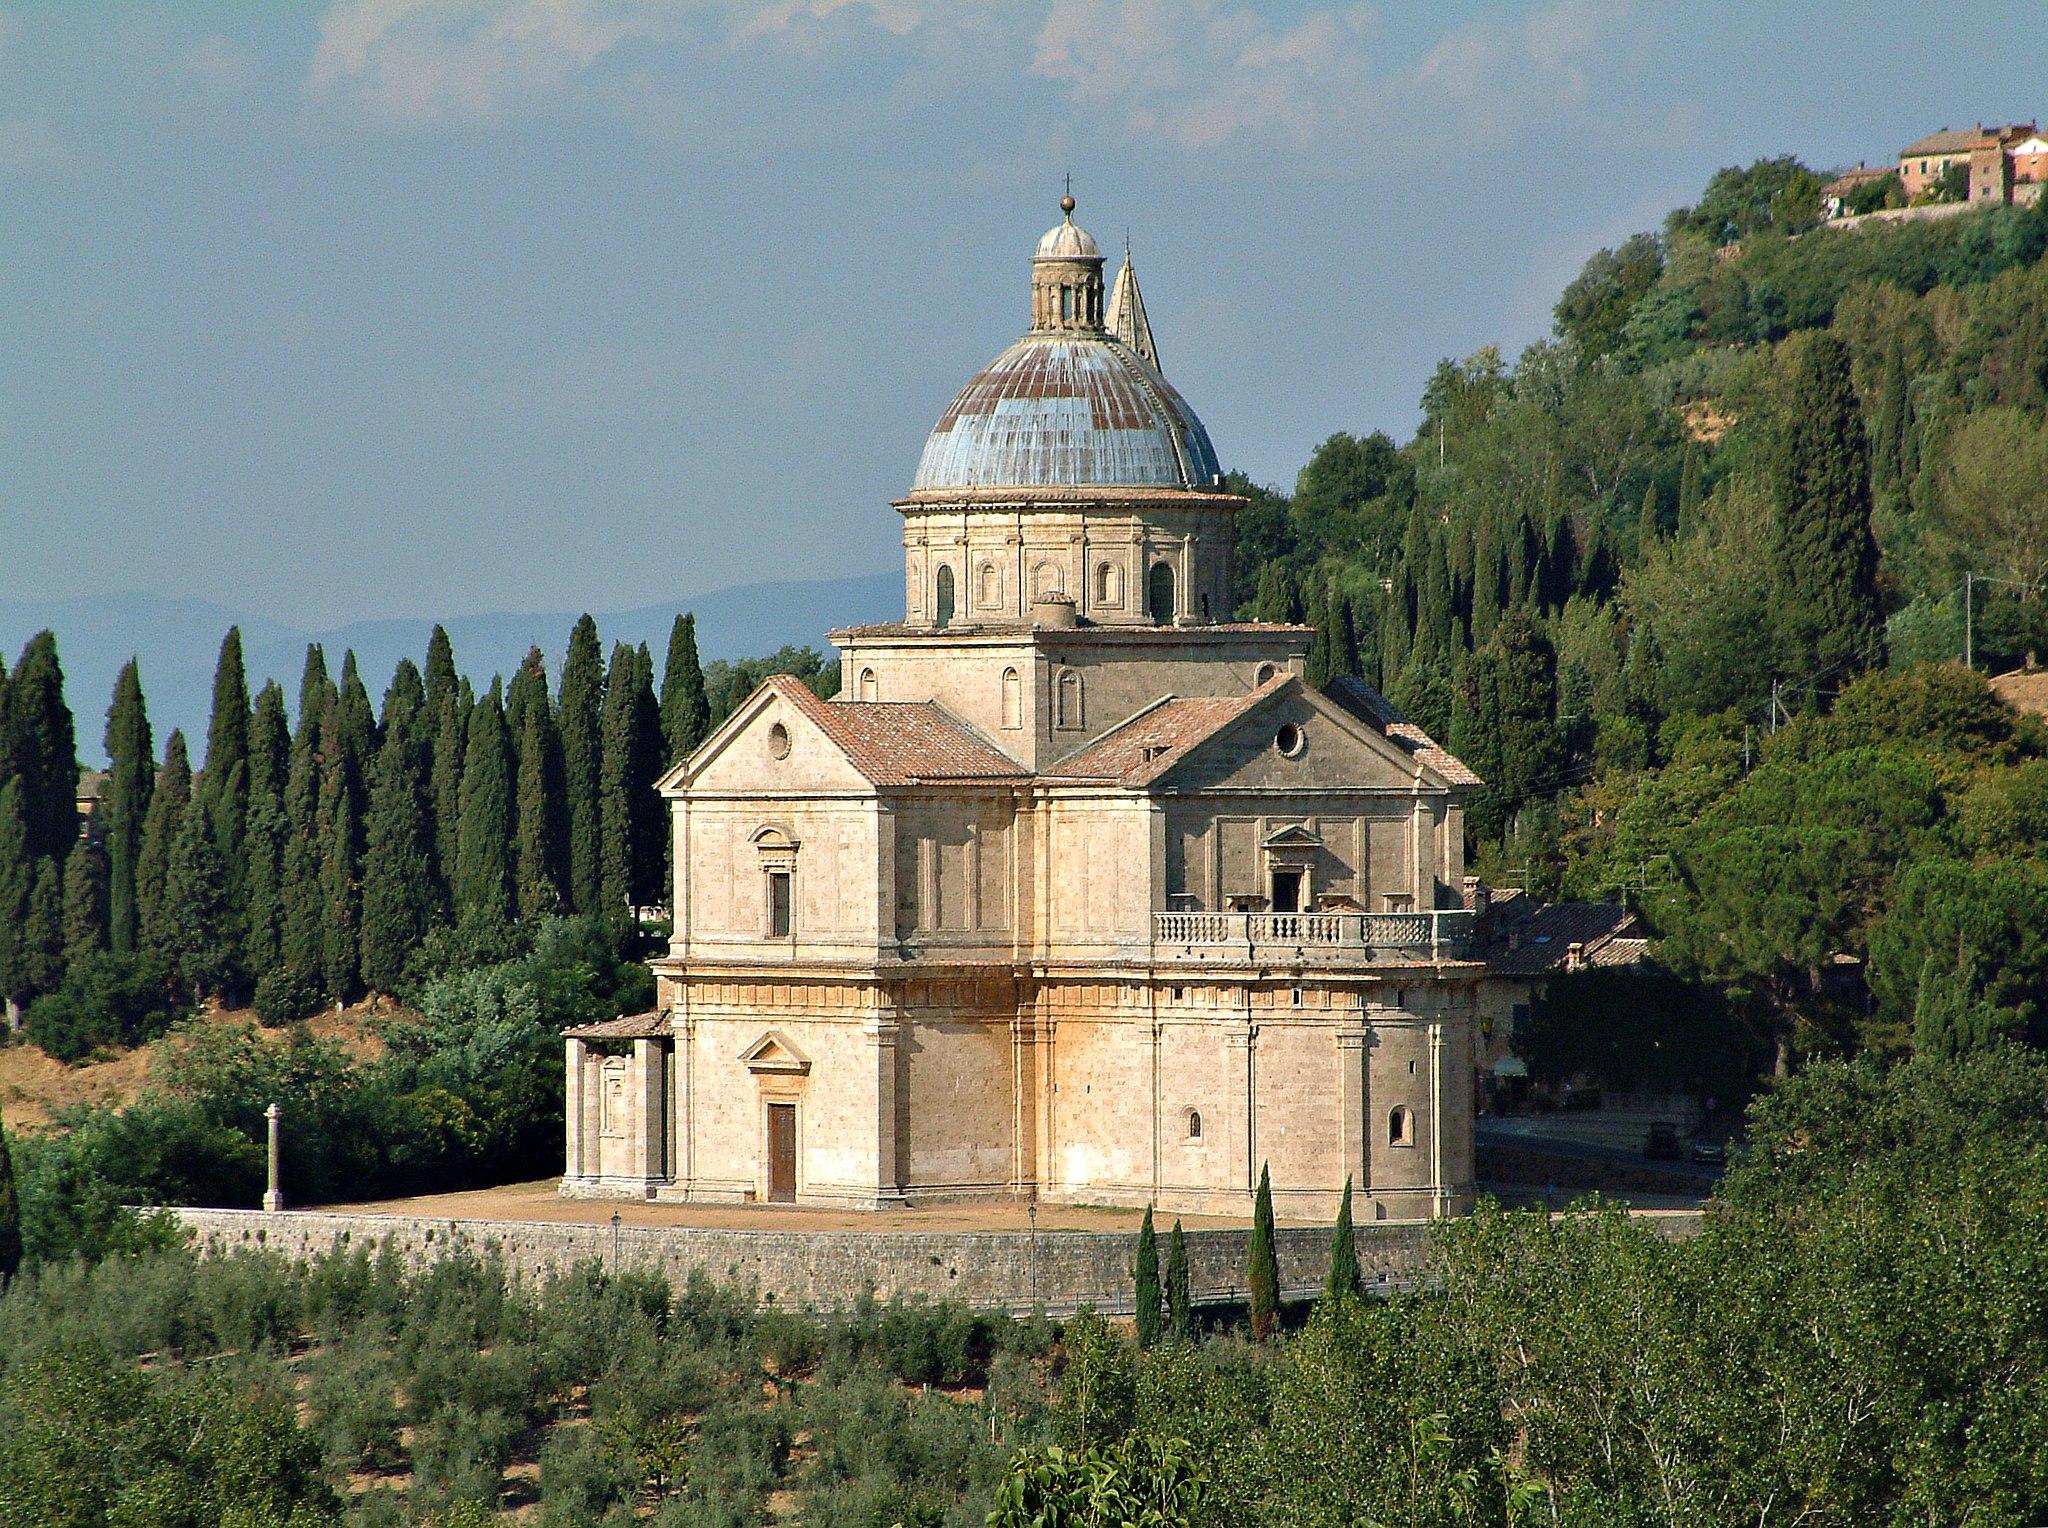 Montepulciano - Madonna di San Biagio